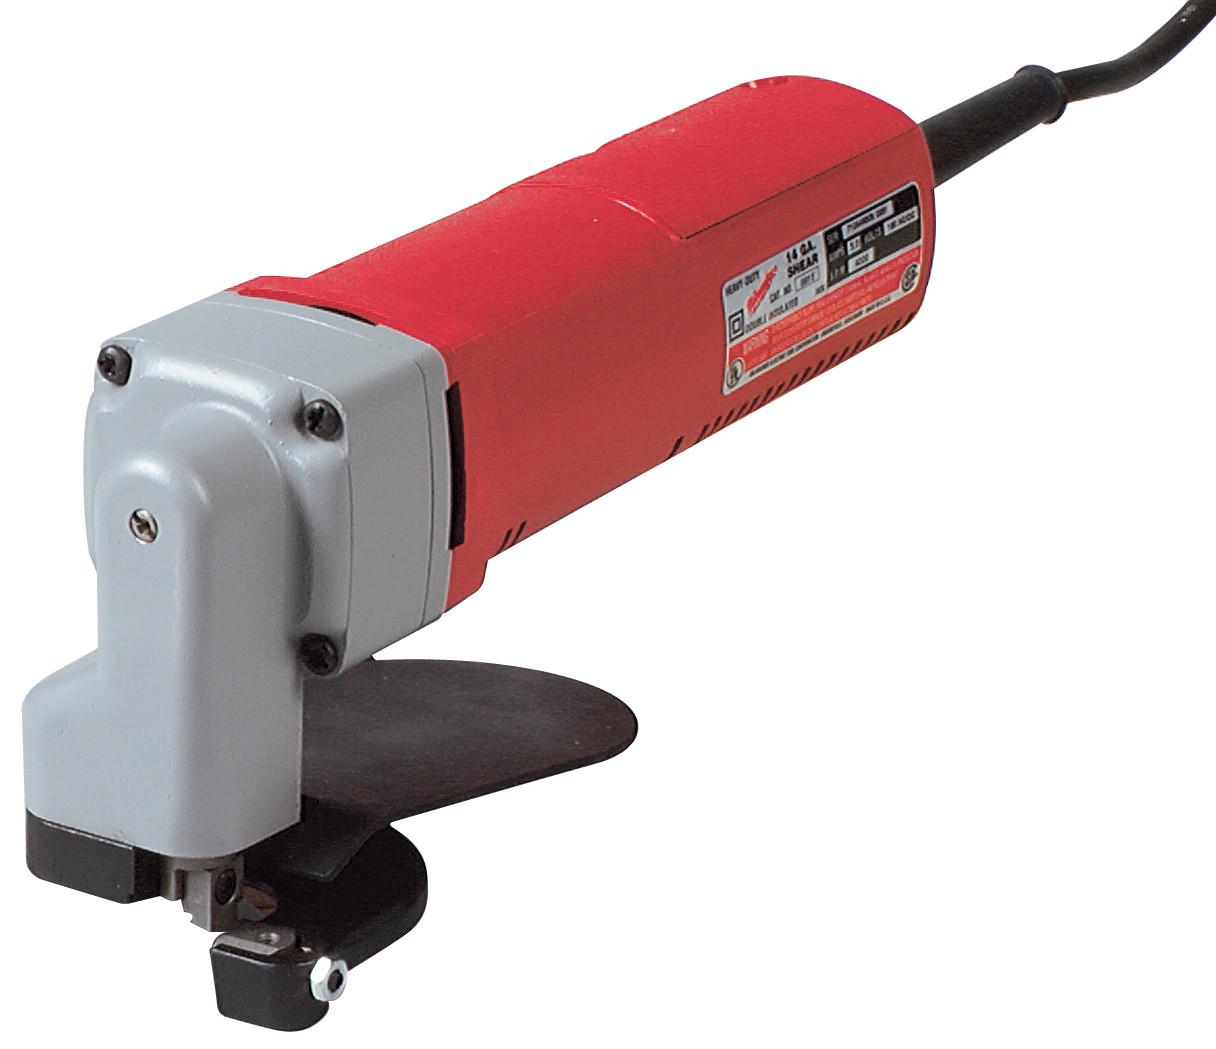 Milwaukee® 6815 Corded Electric Shear, 14 ga in Steel, 16 ga in Stainless Steel Cutting, 4000 spm, 120 VAC/VDC, 10-1/4 in OAL